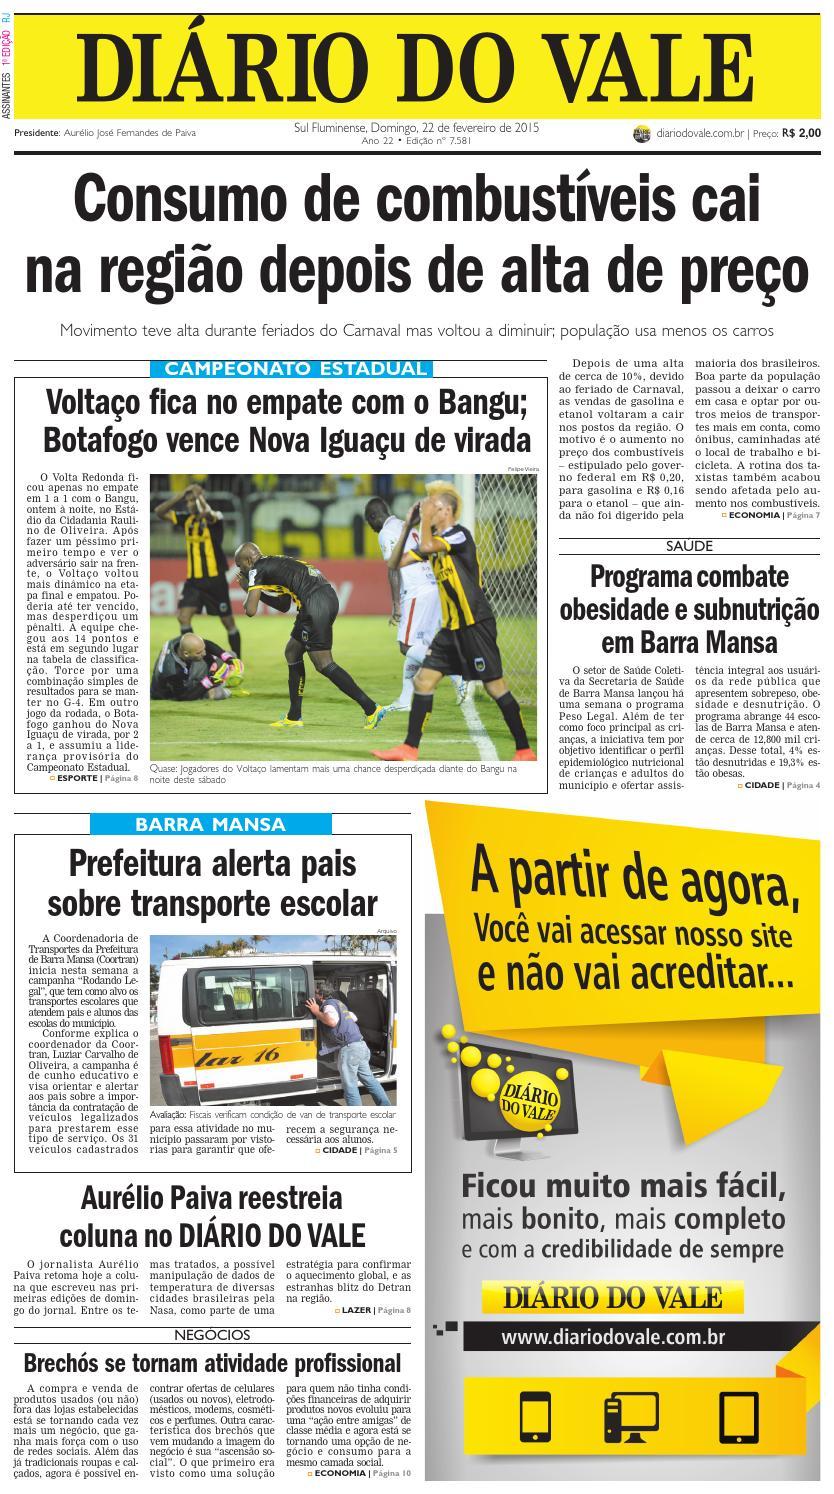 d3db6947a4 7581 diario domingo 22 02 2015 by Diário do Vale - issuu